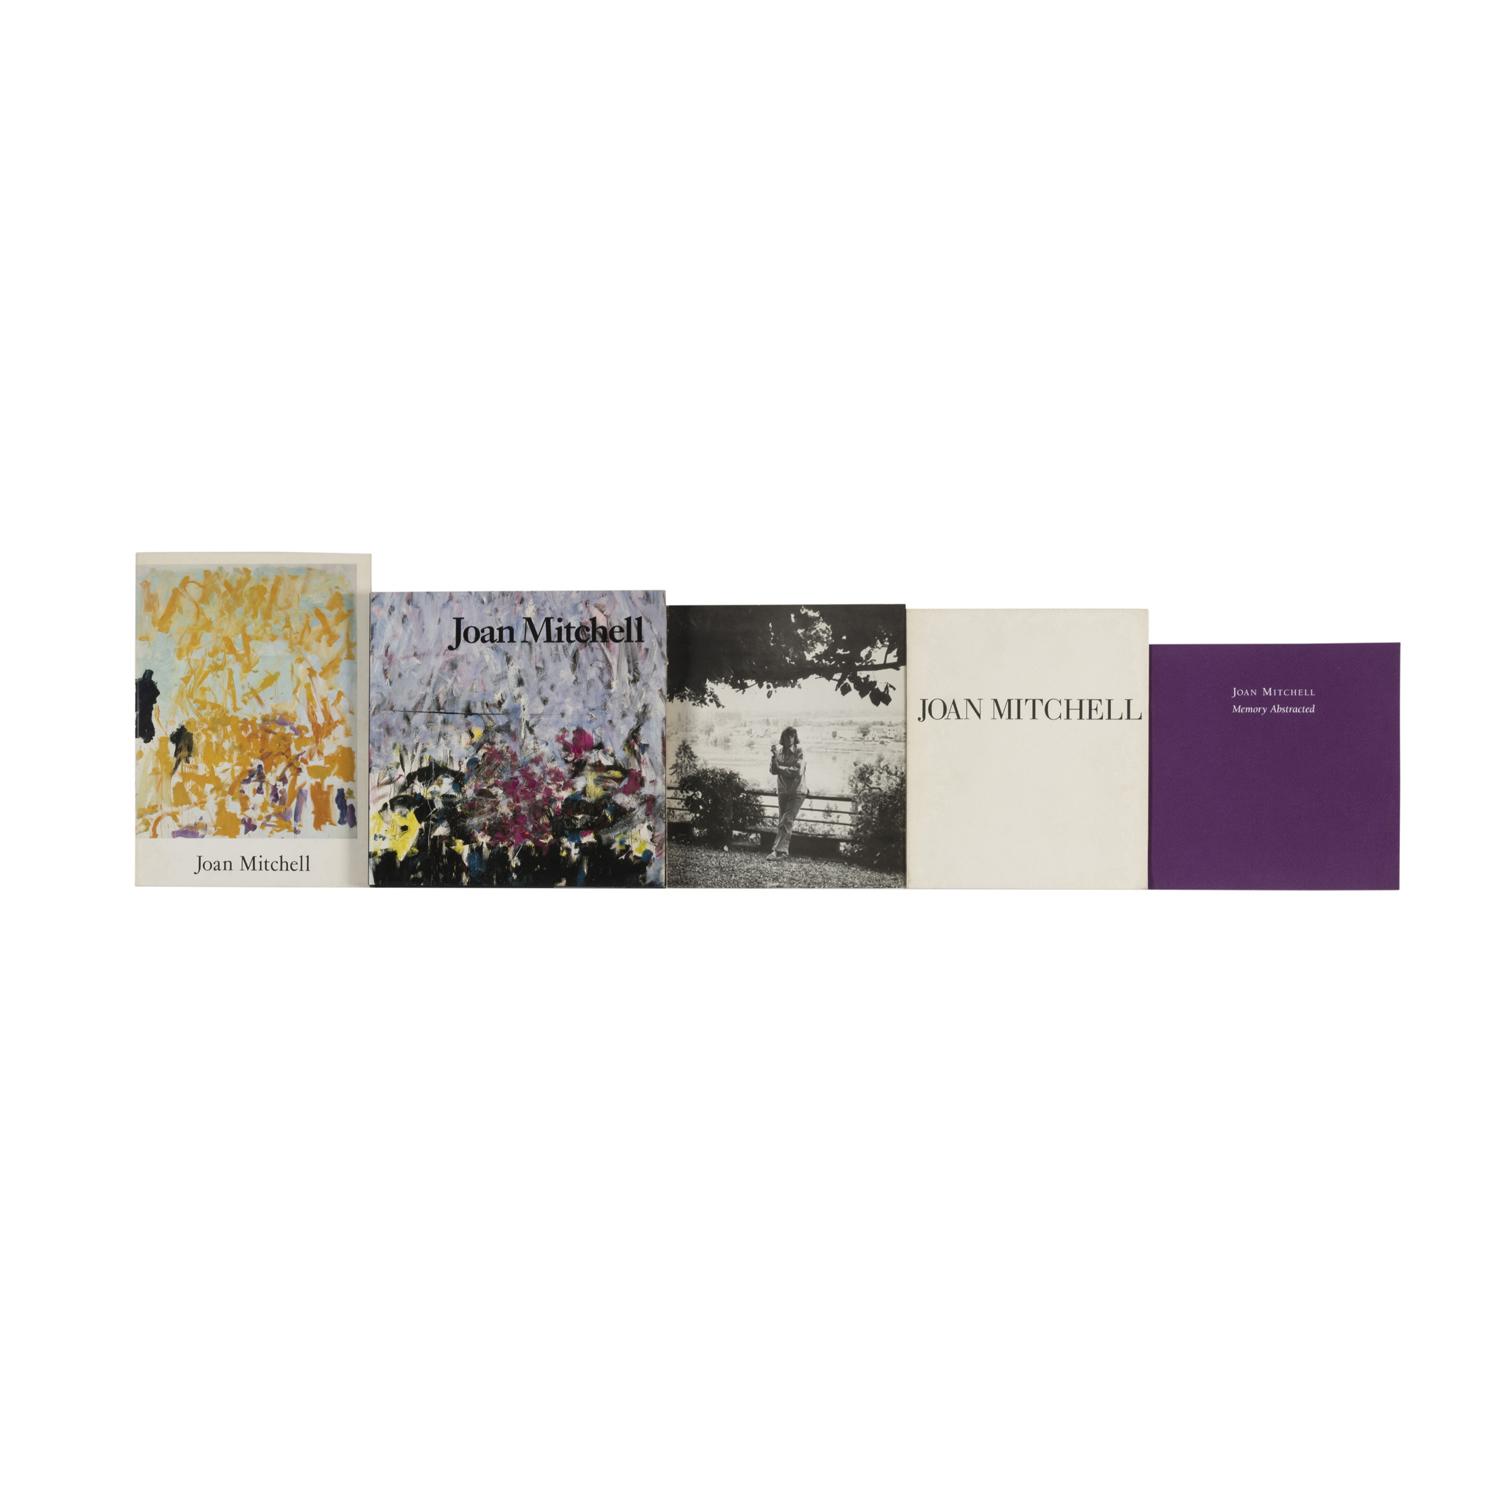 - Joan Mitchell. Choix de peintures 1970-1982, 1982, MAMVP, Paris - J. E...